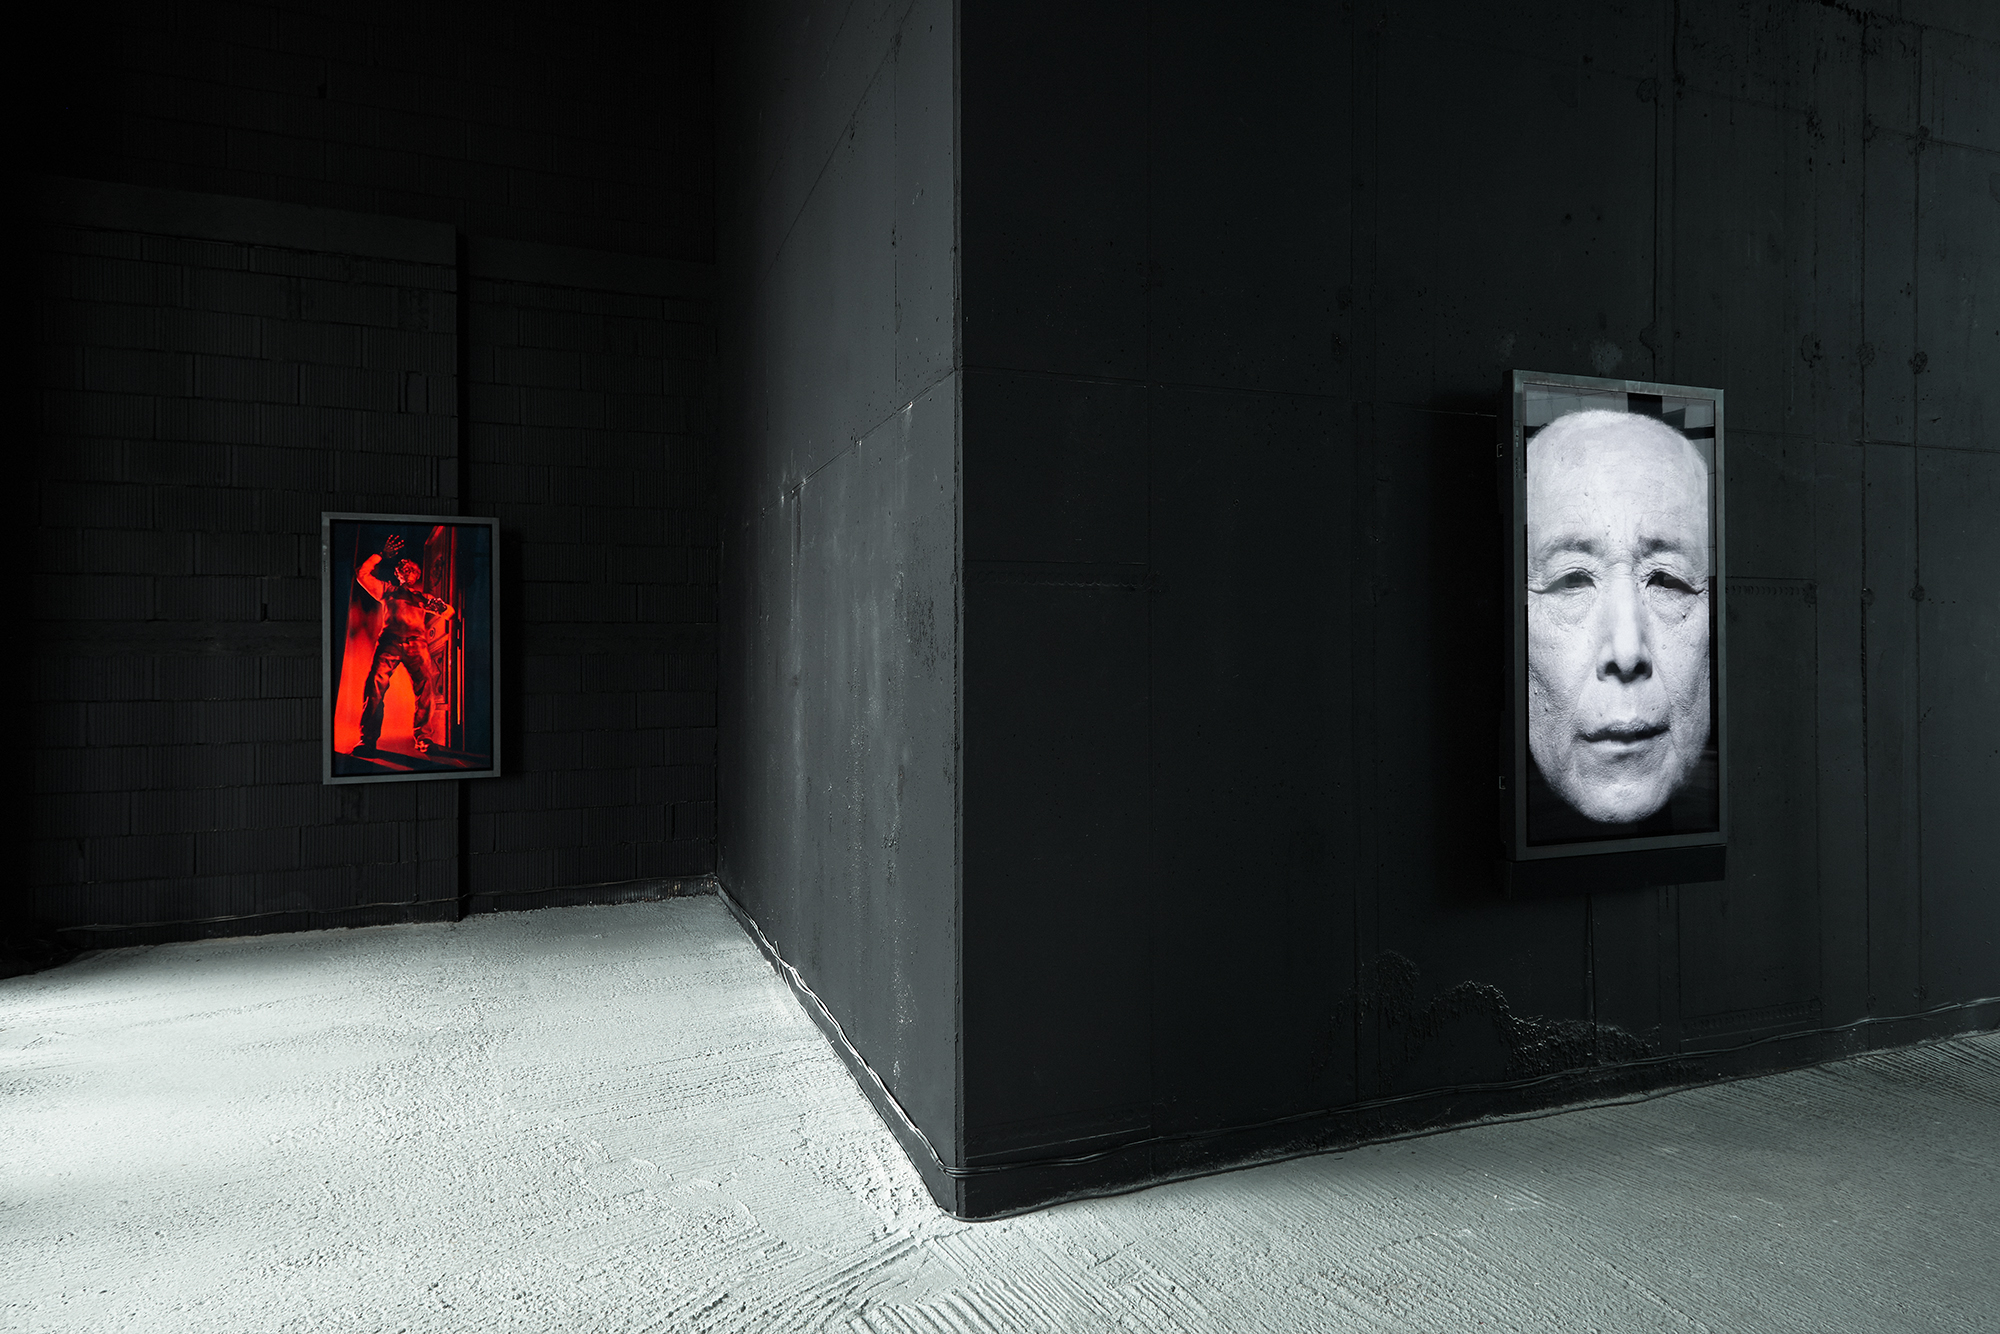 Robert_Willson_exhibition_02.jpg